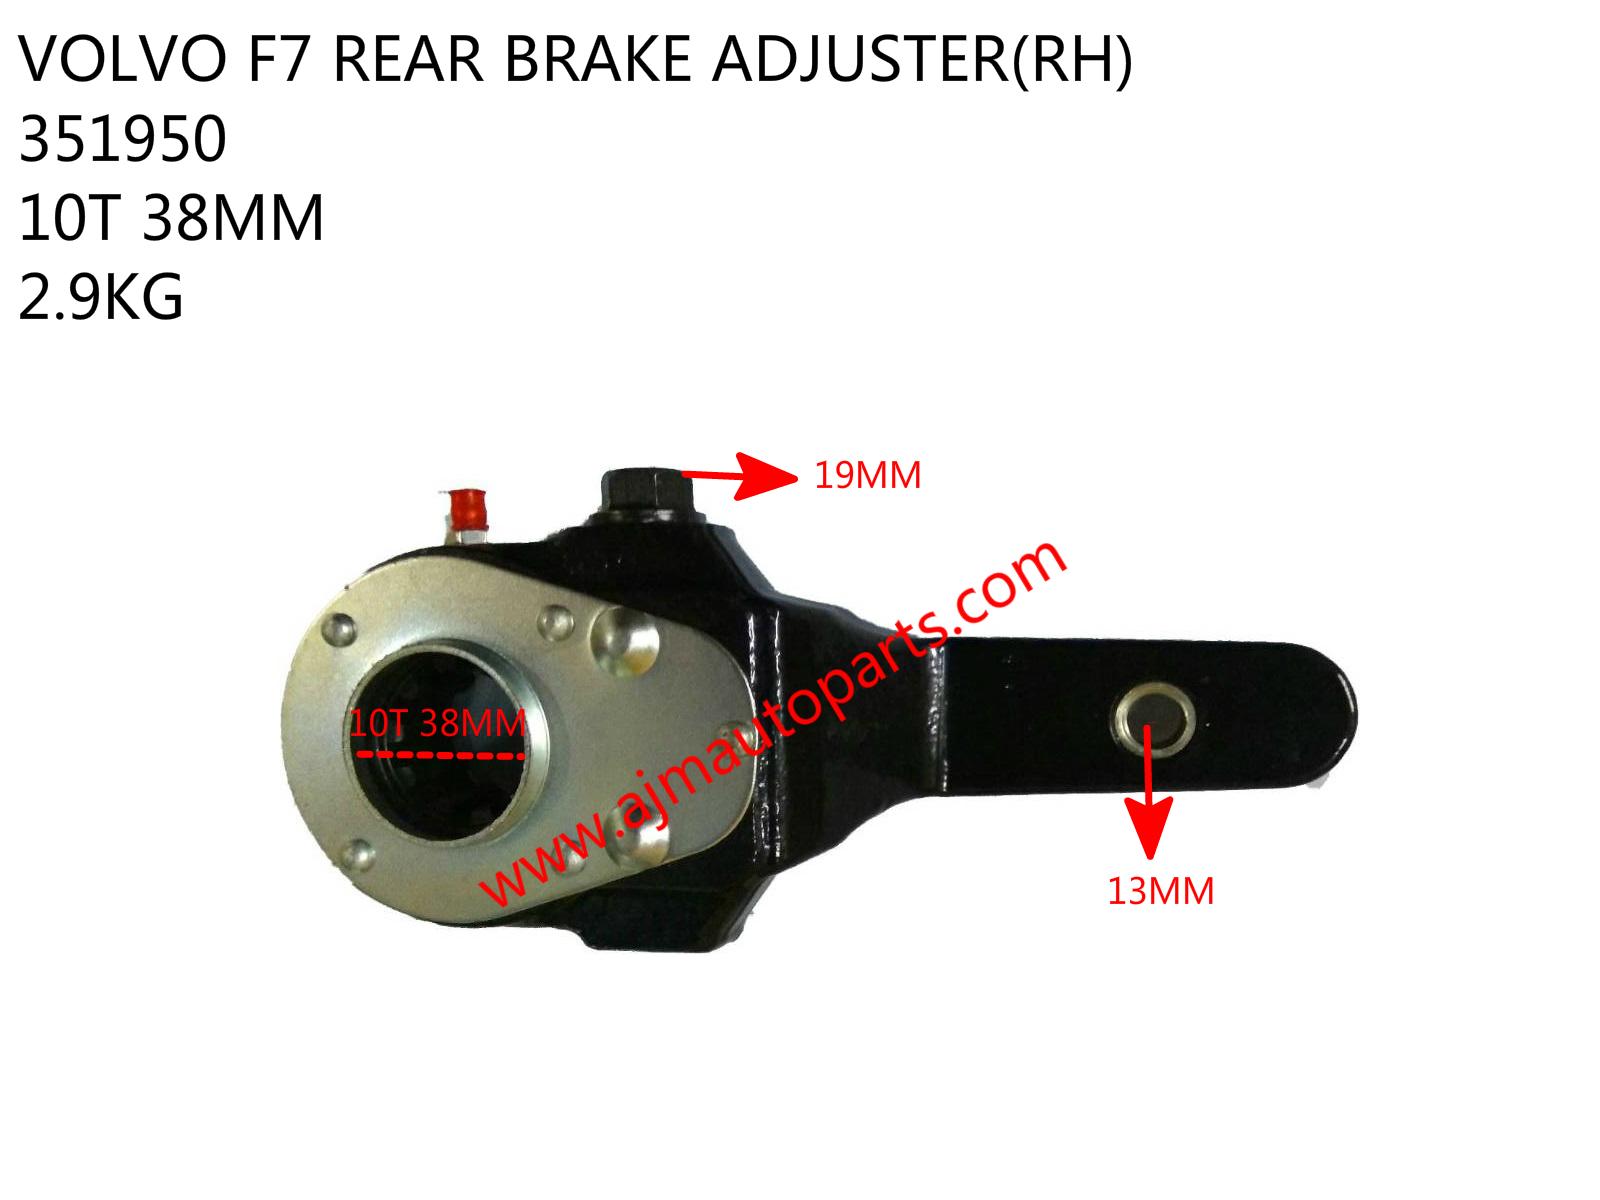 VOLVO F7 REAR BRAKE ADJUSTER(RH)-351950